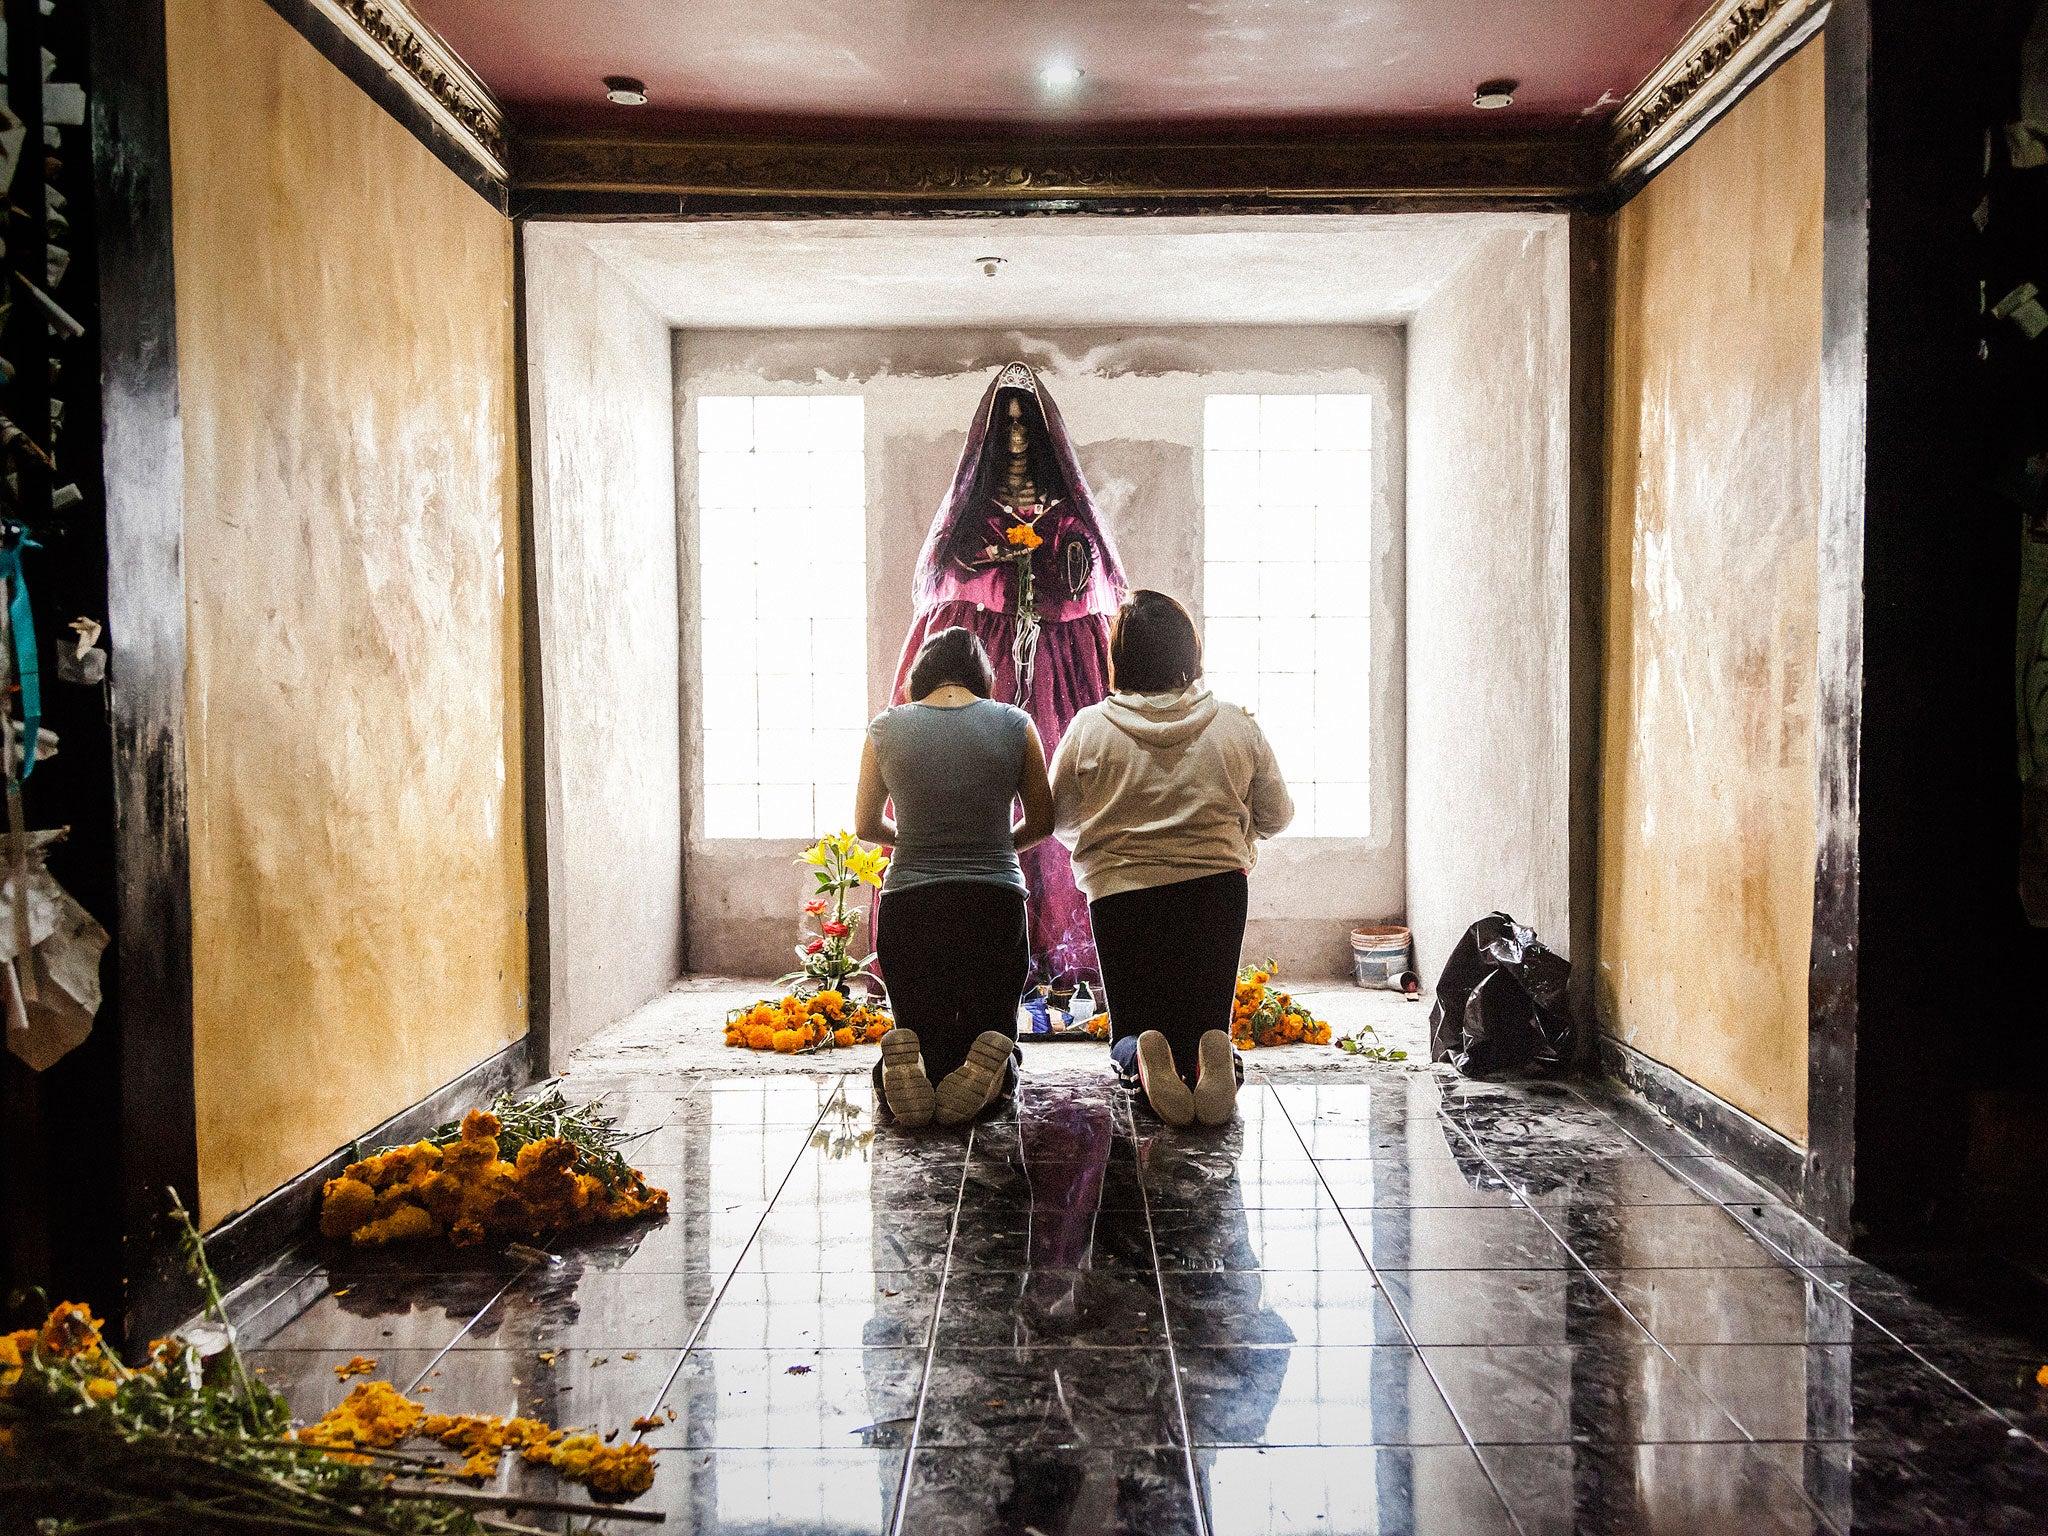 Santa Muerte: New photography book focuses on the devotees